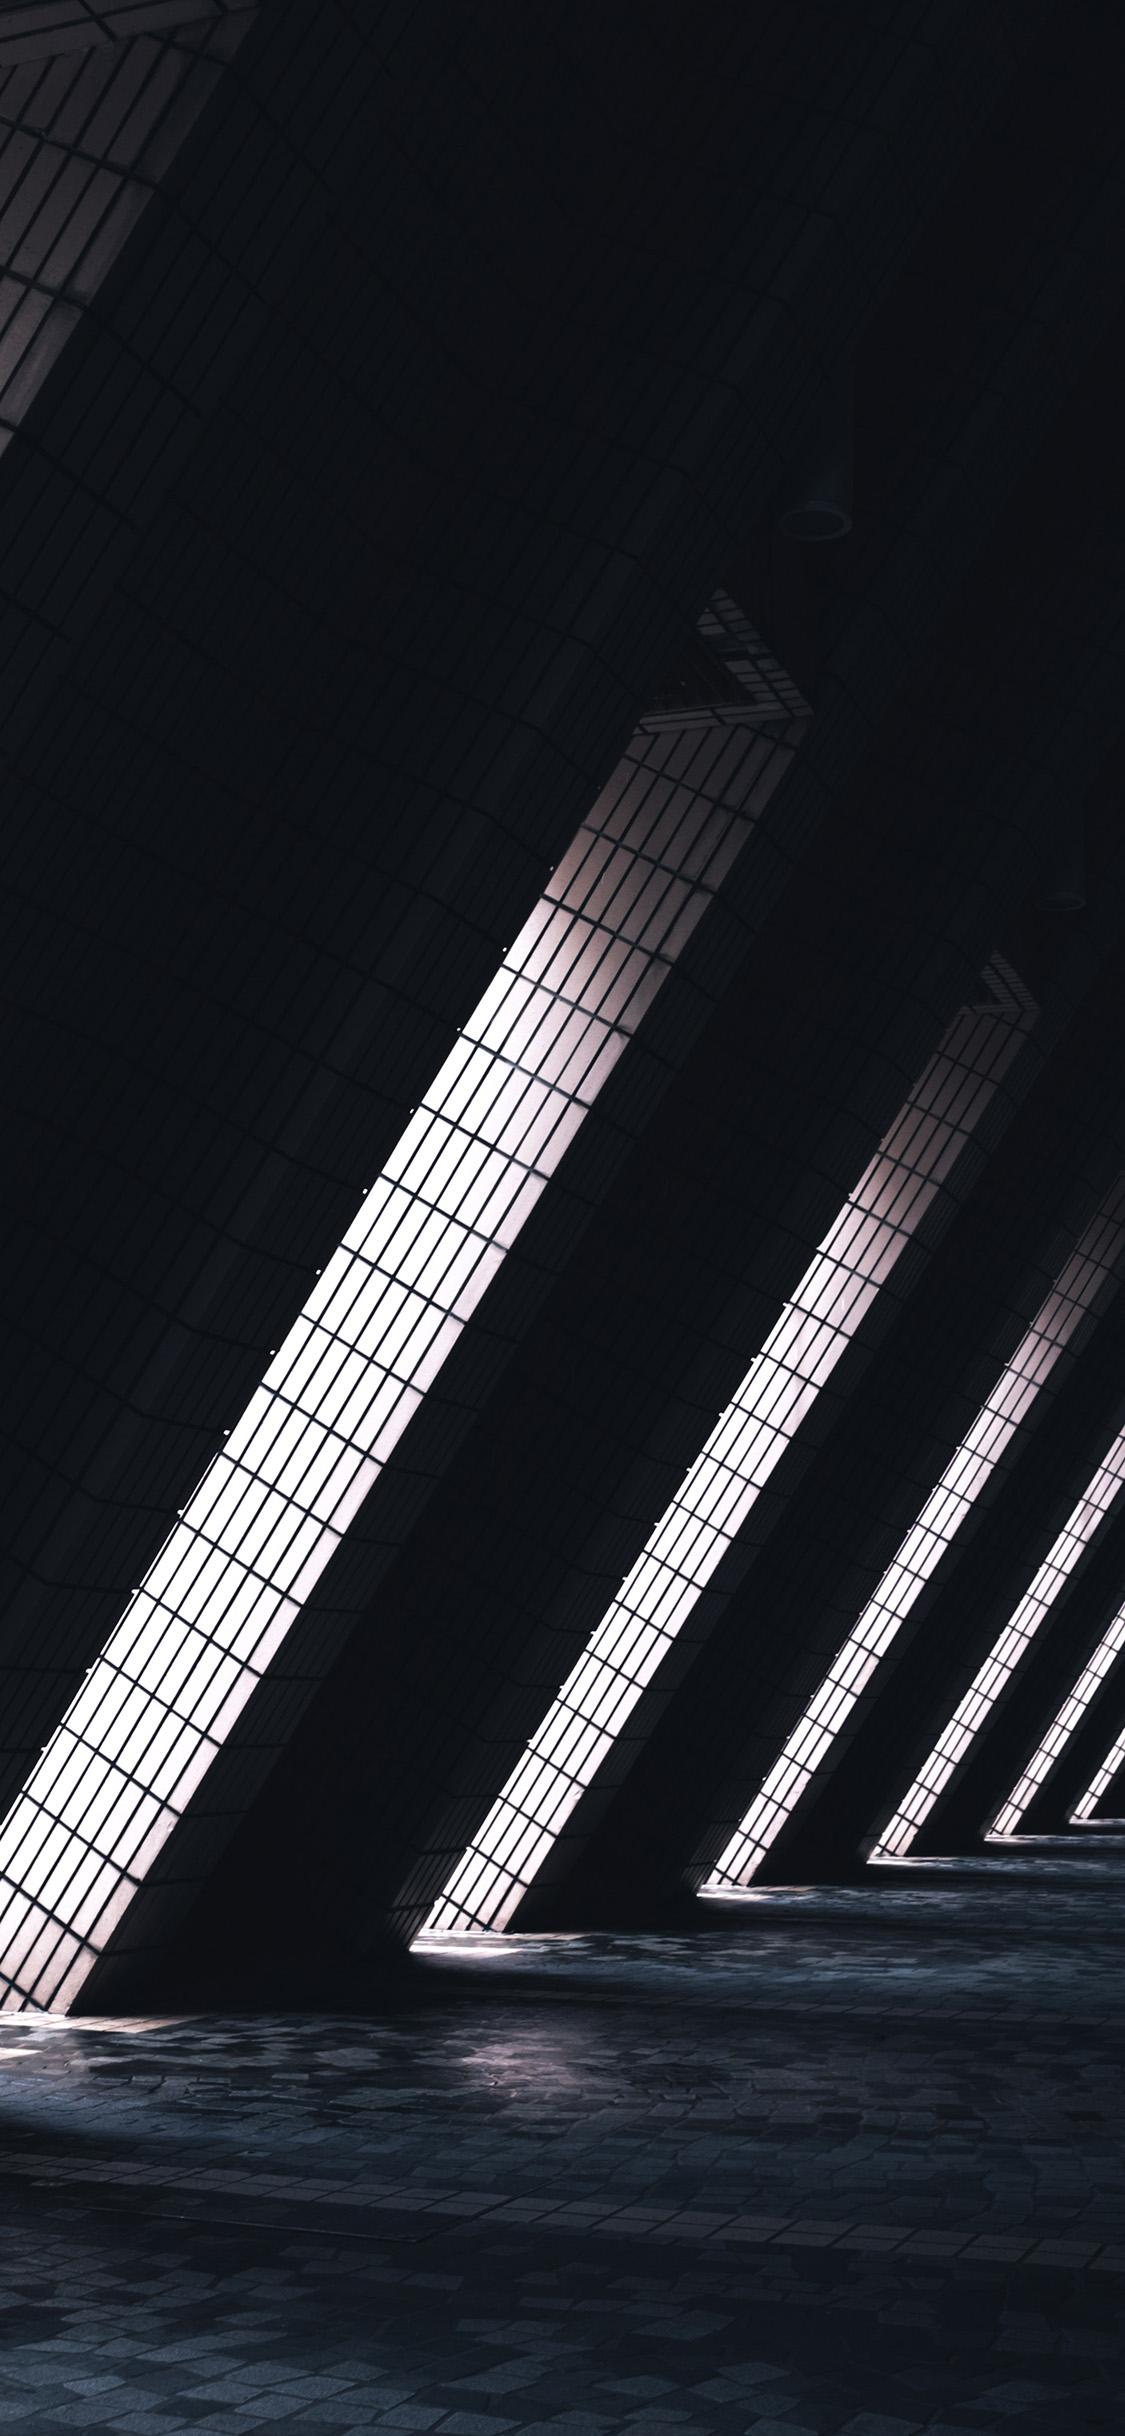 iPhonexpapers.com-Apple-iPhone-wallpaper-od73-nature-light-dark-architecture